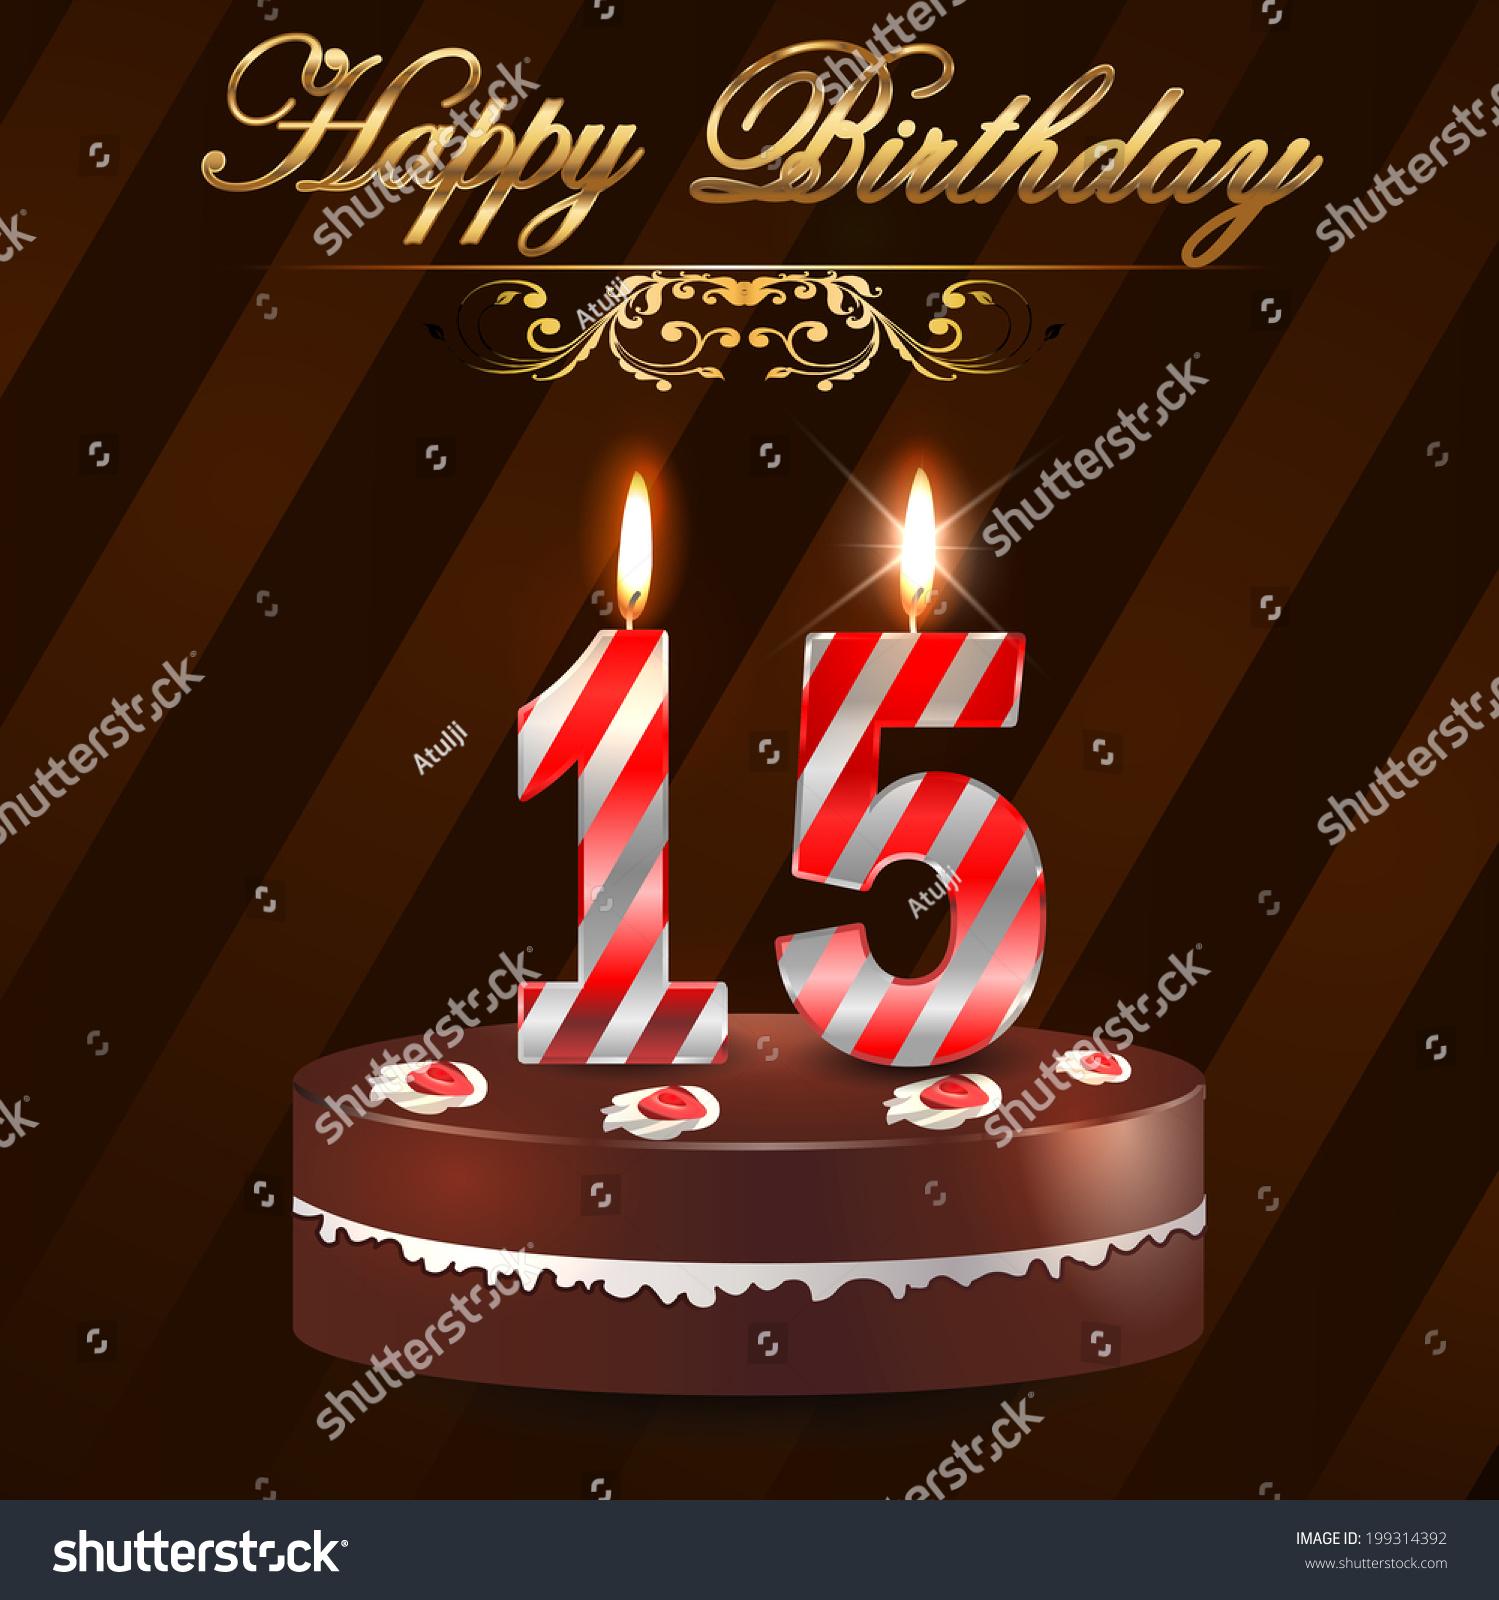 Terrific 15 Year Happy Birthday Card Cake Stock Vector Royalty Free 199314392 Funny Birthday Cards Online Inifofree Goldxyz